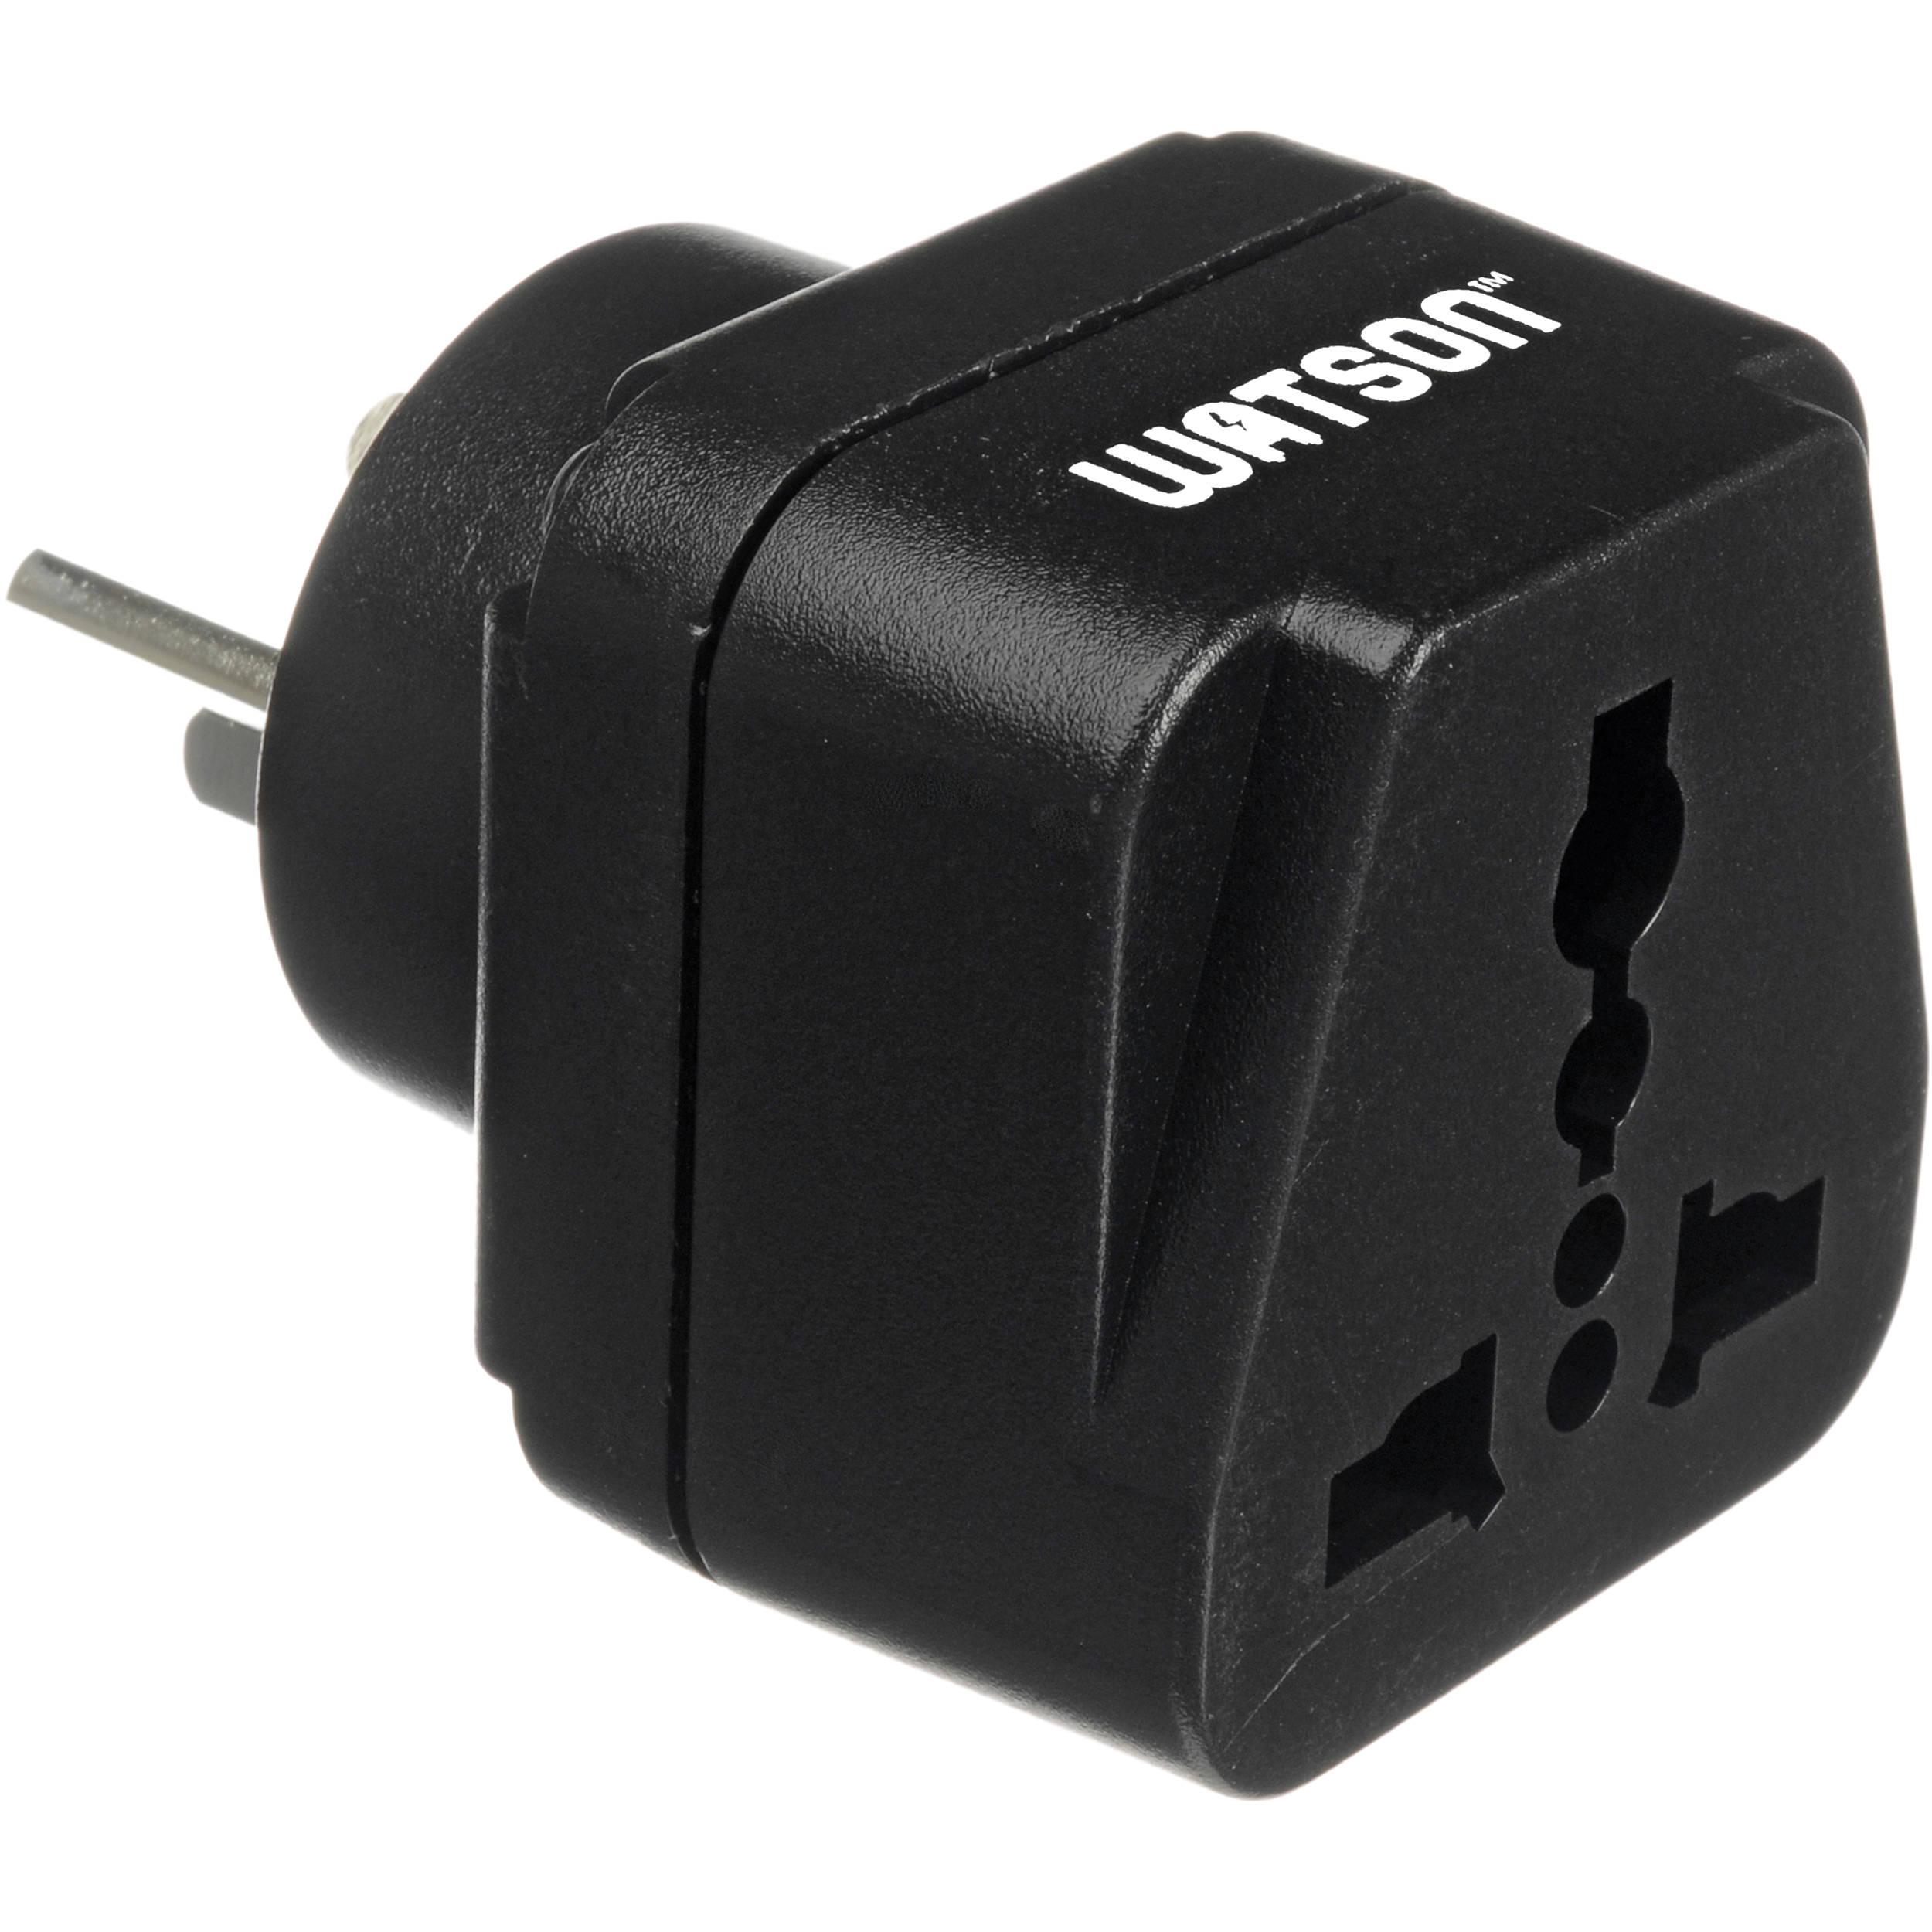 watson adapter plug 3 prong usa to 3 prong israel apg usa ie. Black Bedroom Furniture Sets. Home Design Ideas